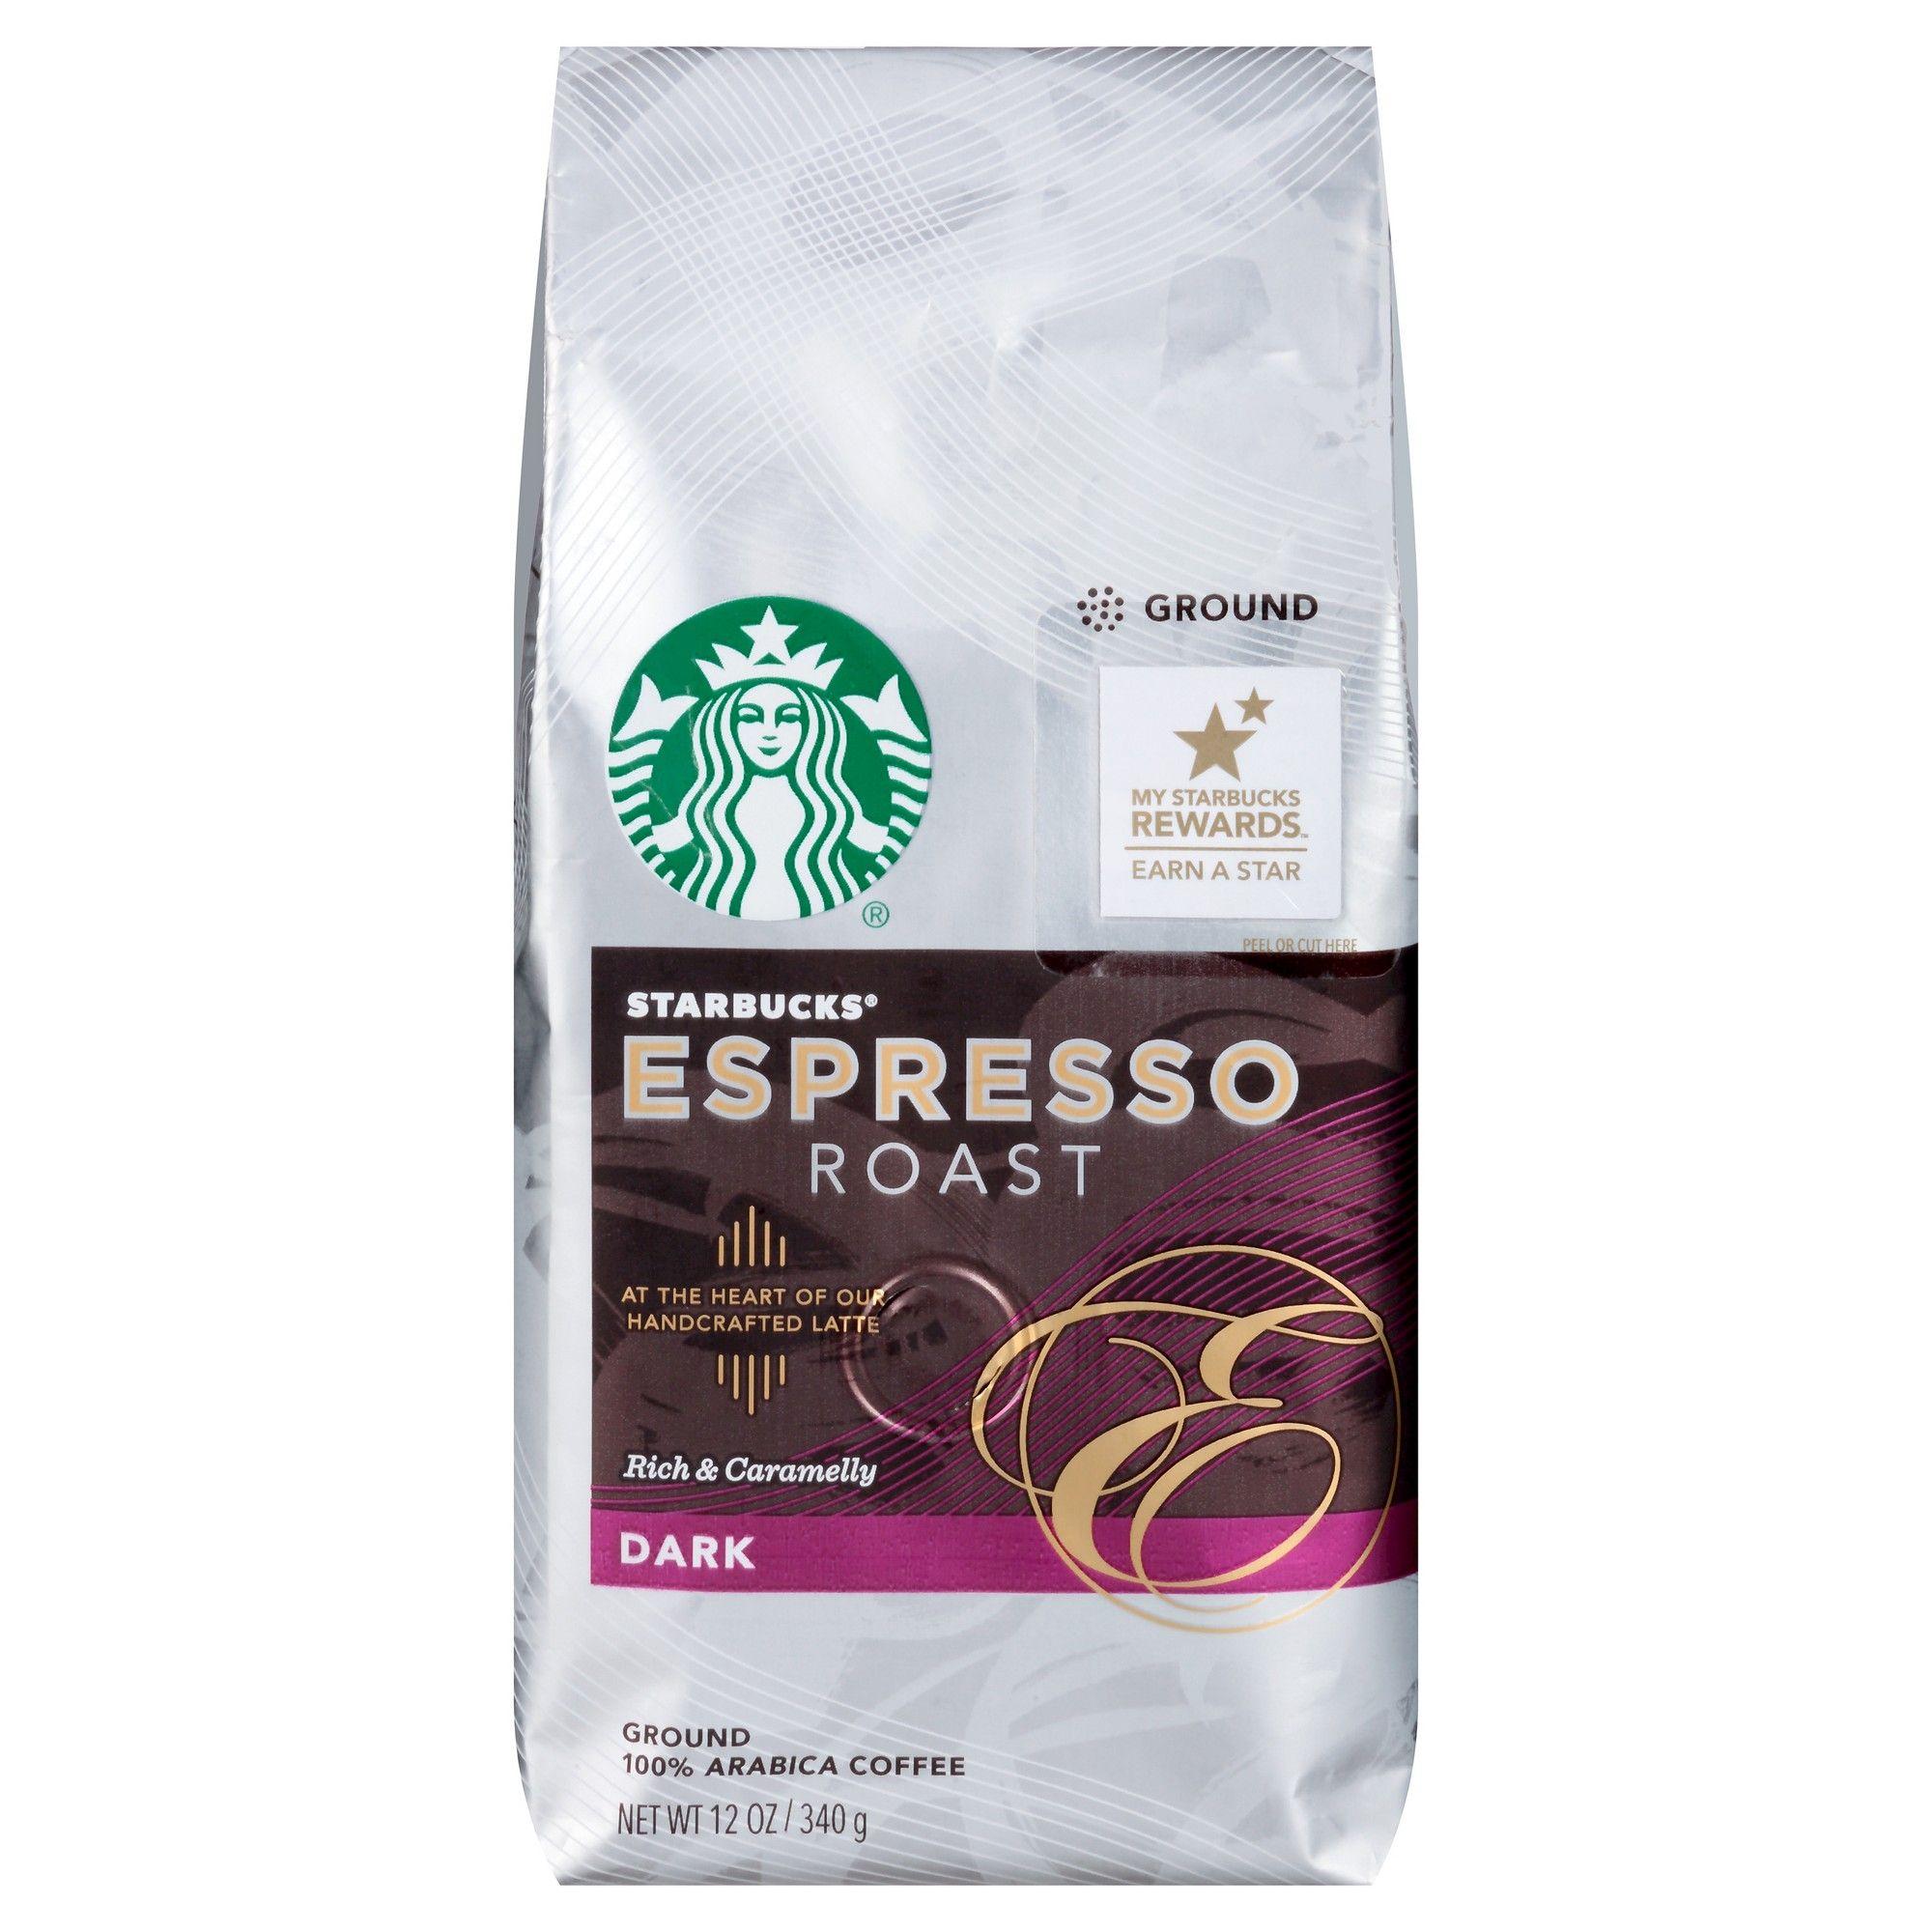 Starbucks Espresso Roast Dark Roast Ground Coffee 12oz